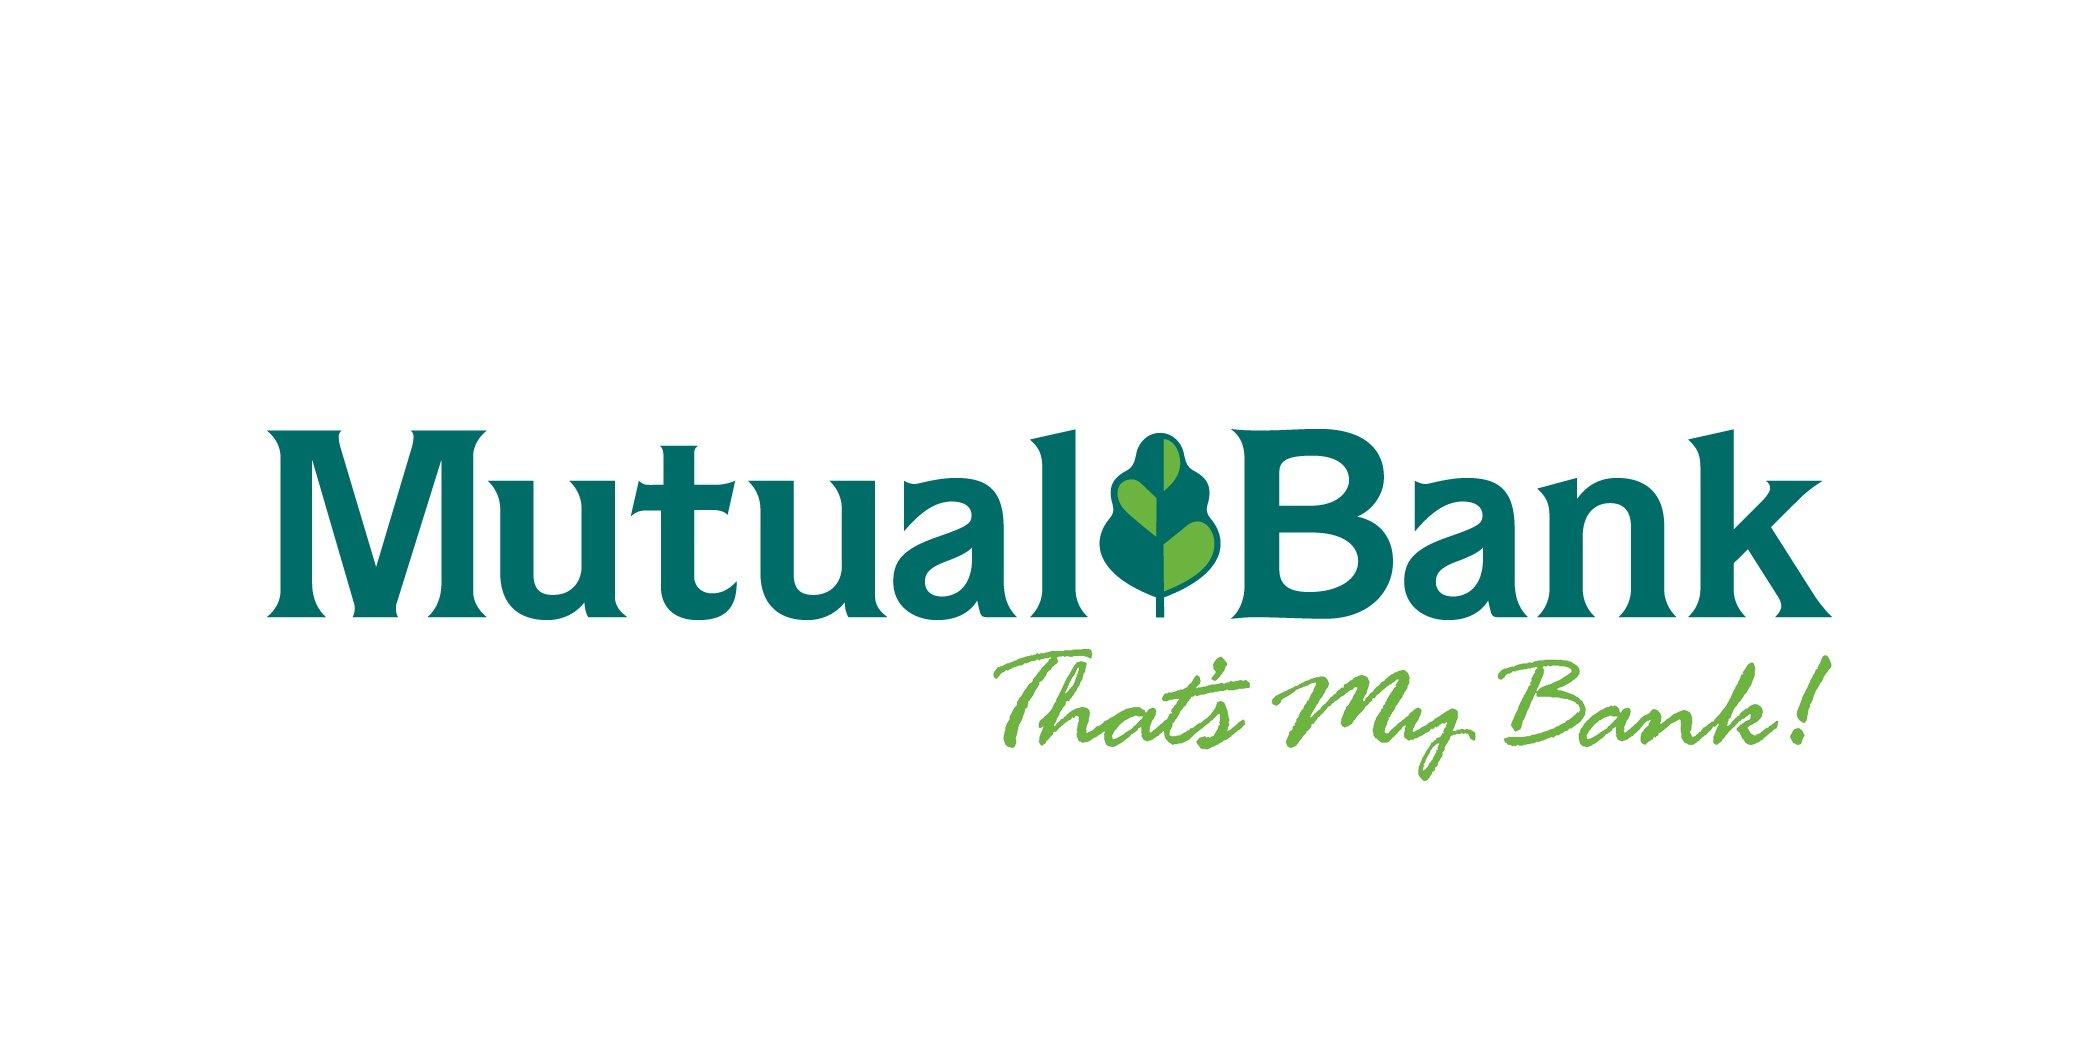 Mutual_Bank_Green-1.jpg